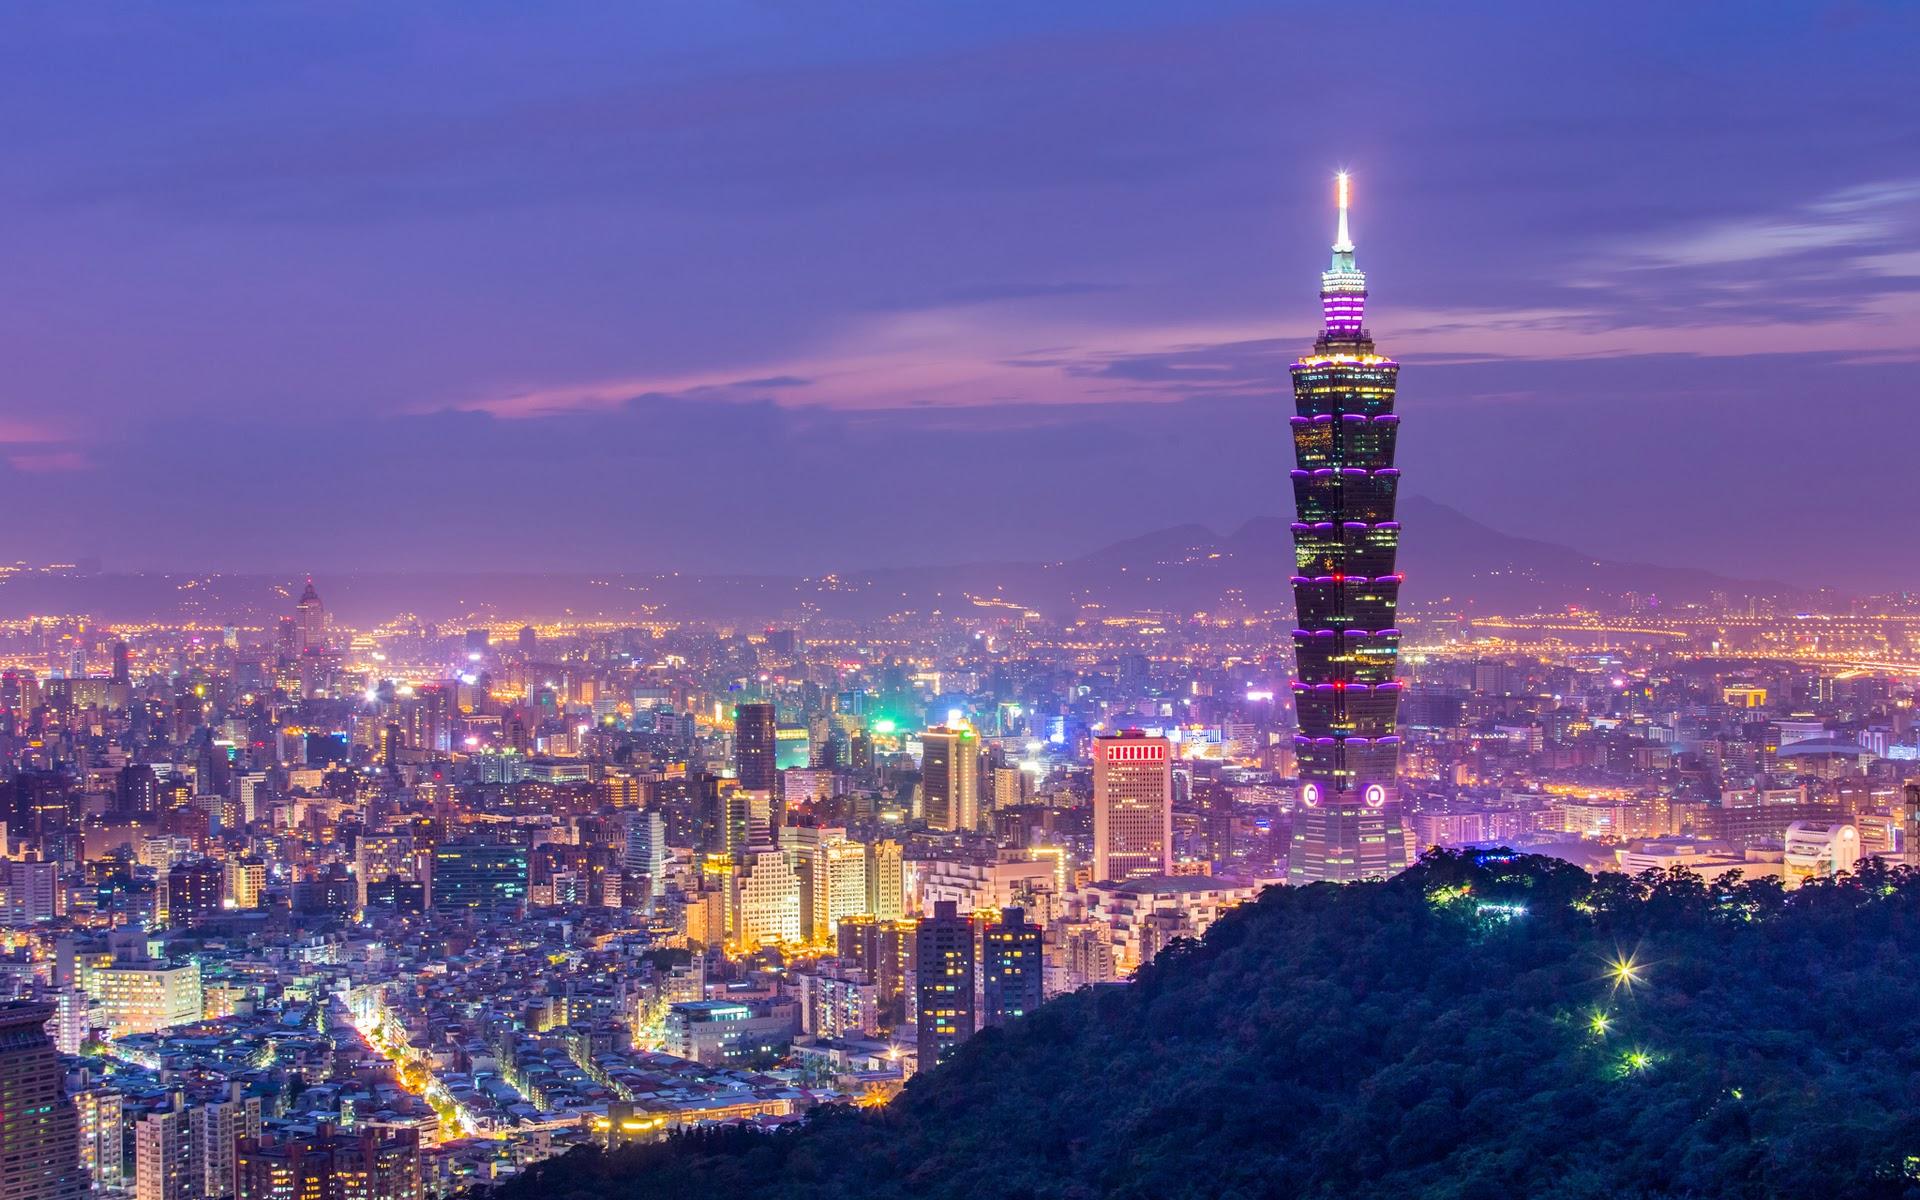 Air Canada Roundtrip Flight: Various U.S. Cities to Taipei, Taiwan (TPE)  from $520 (Travel Jan - June)